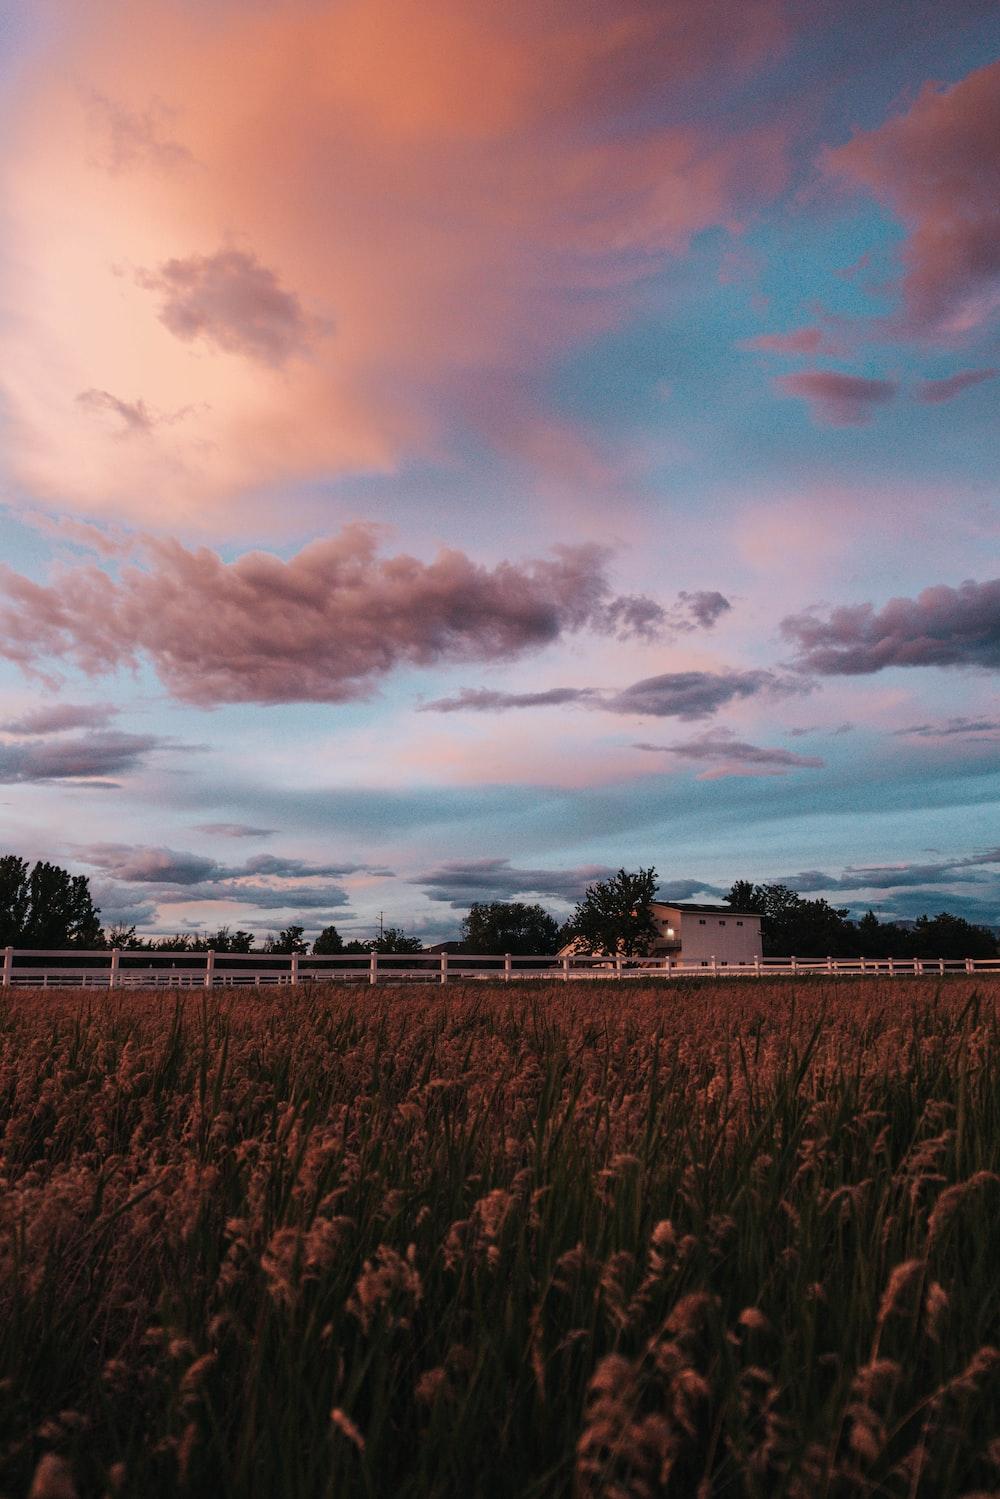 green field near house under orange and blue skies